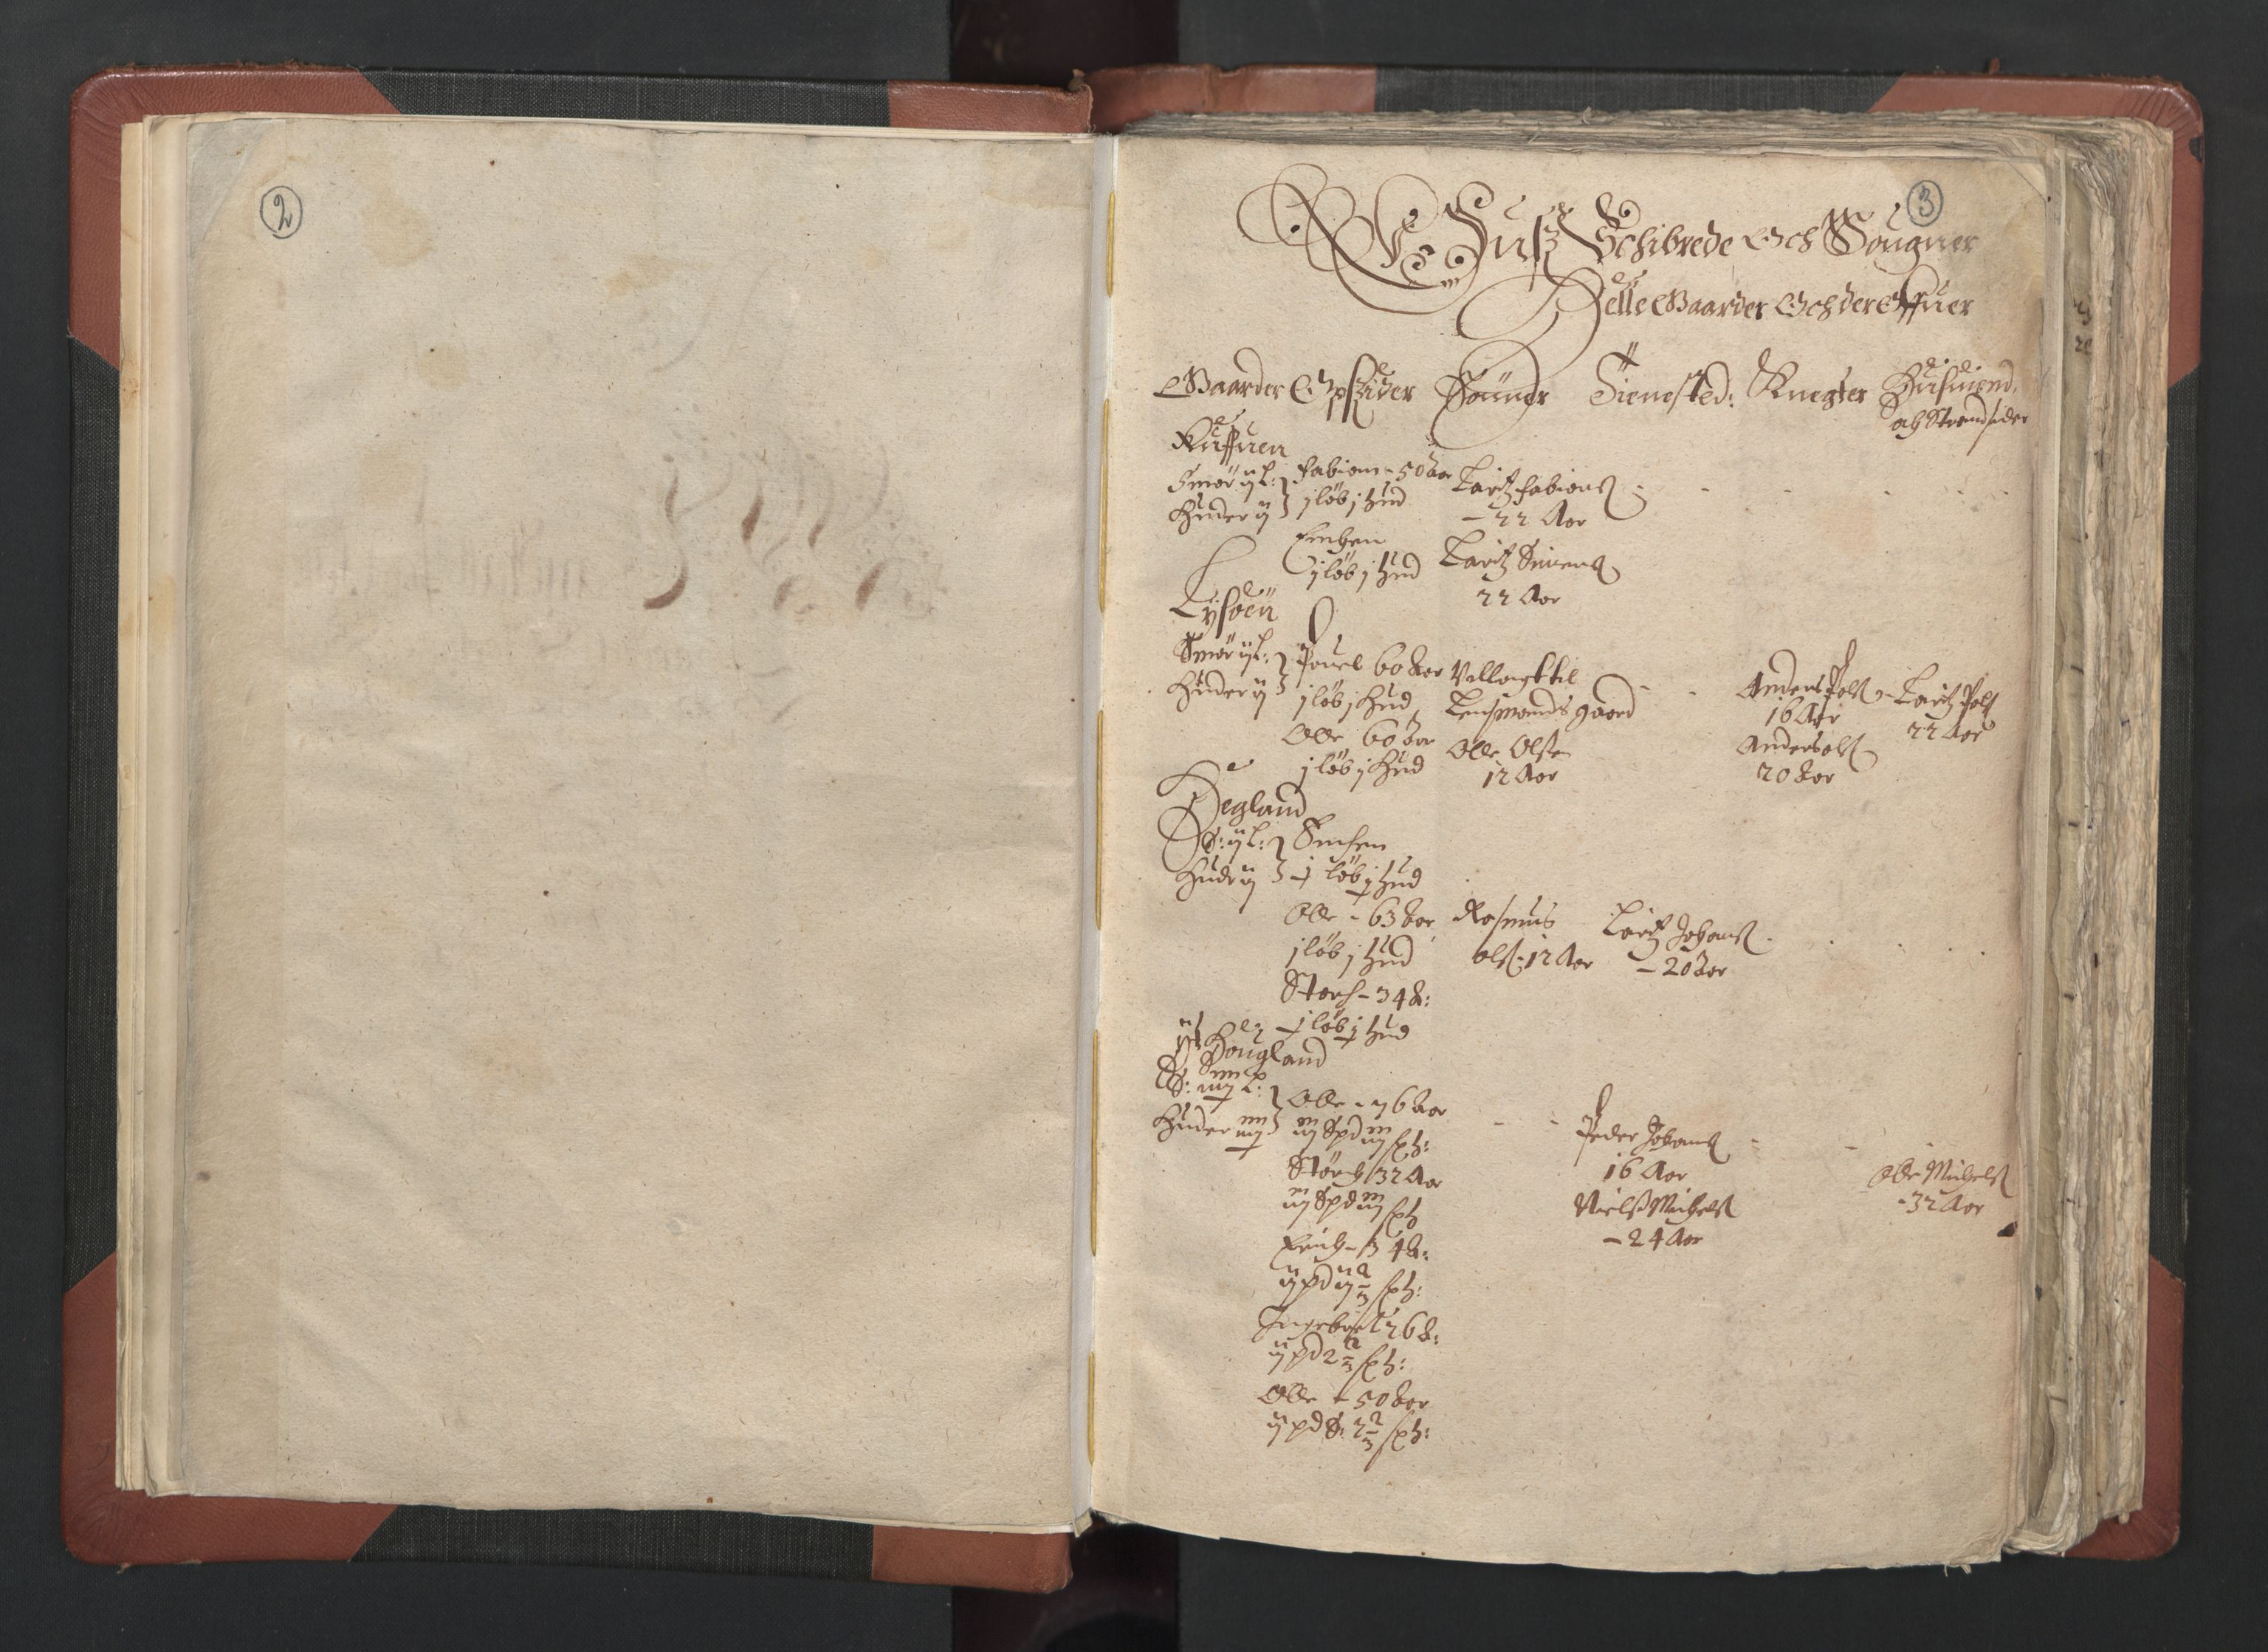 RA, Fogdenes og sorenskrivernes manntall 1664-1666, nr. 13: Nordhordland fogderi og Sunnhordland fogderi, 1665, s. 2-3